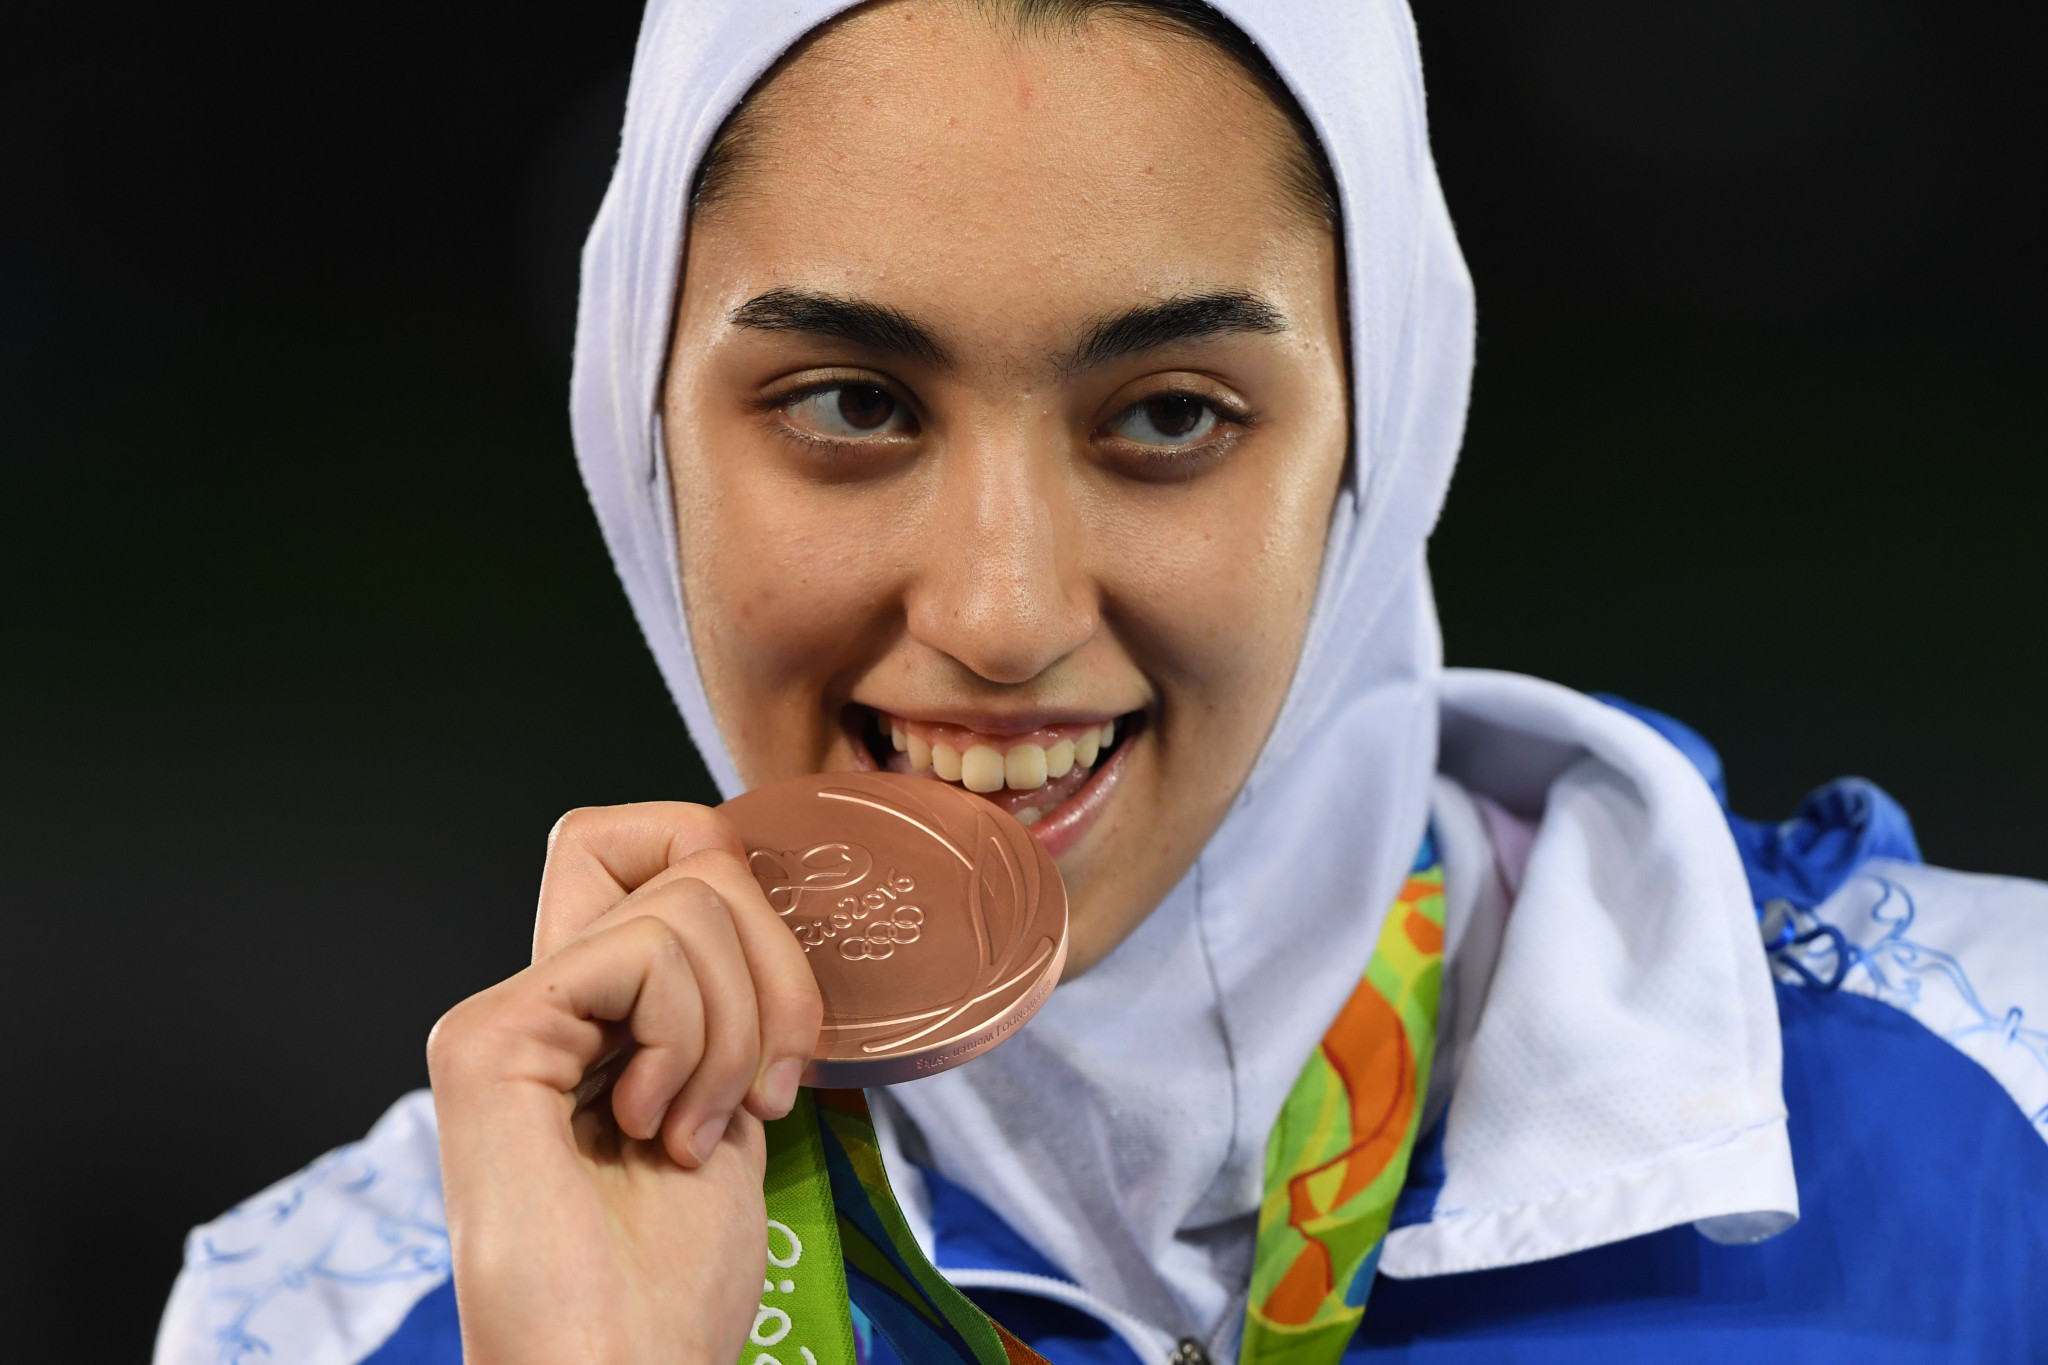 Kimia Alizadeh Zenoorin won bronze at the Rio 2016 Olympics ©Getty Images